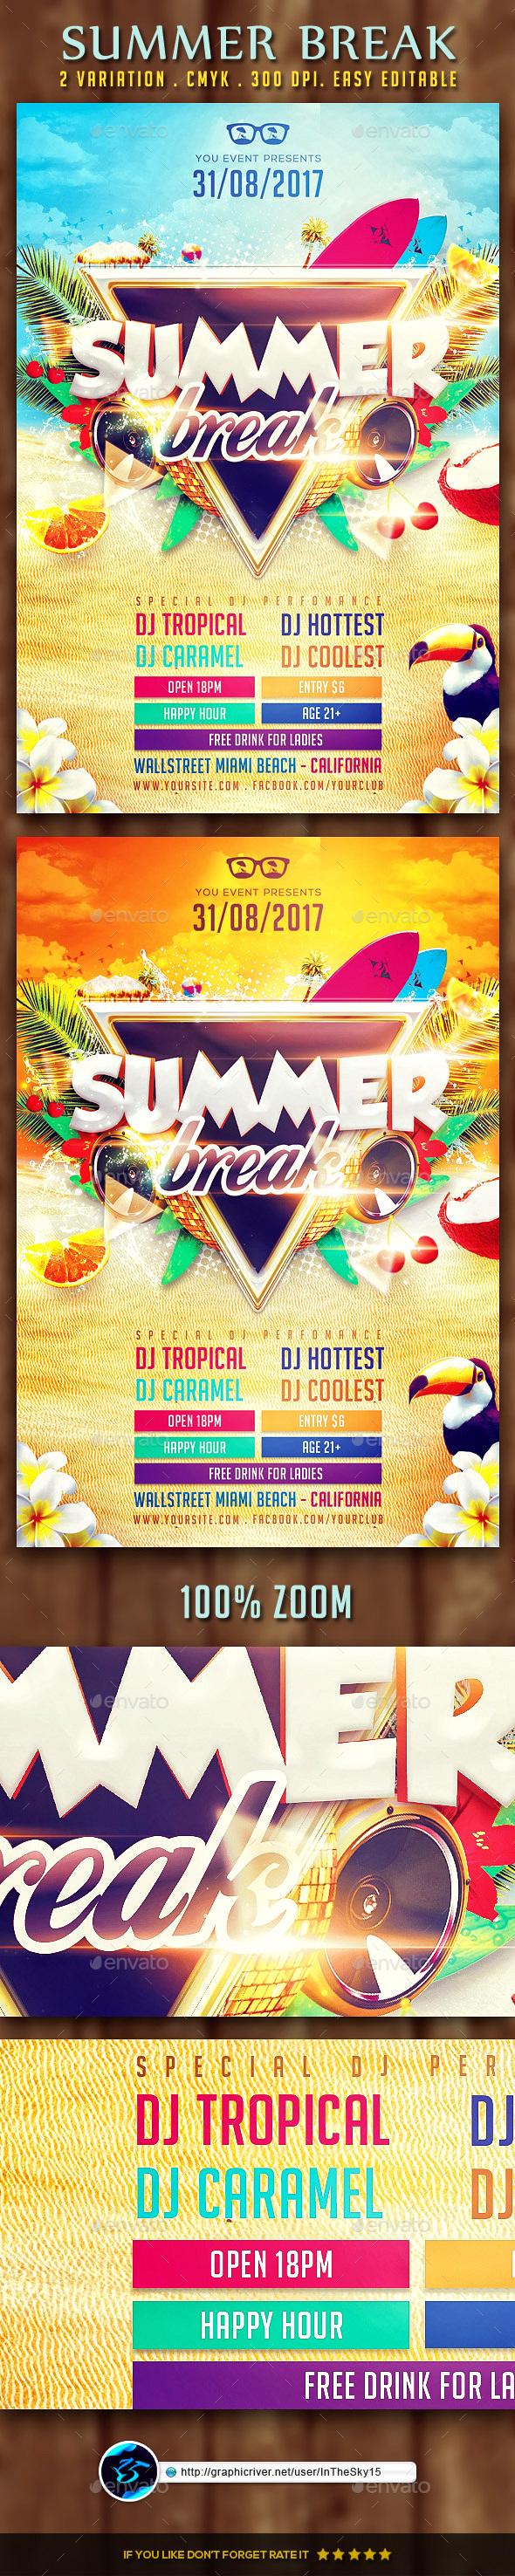 Summer Break Flyer Template - Flyers Print Templates